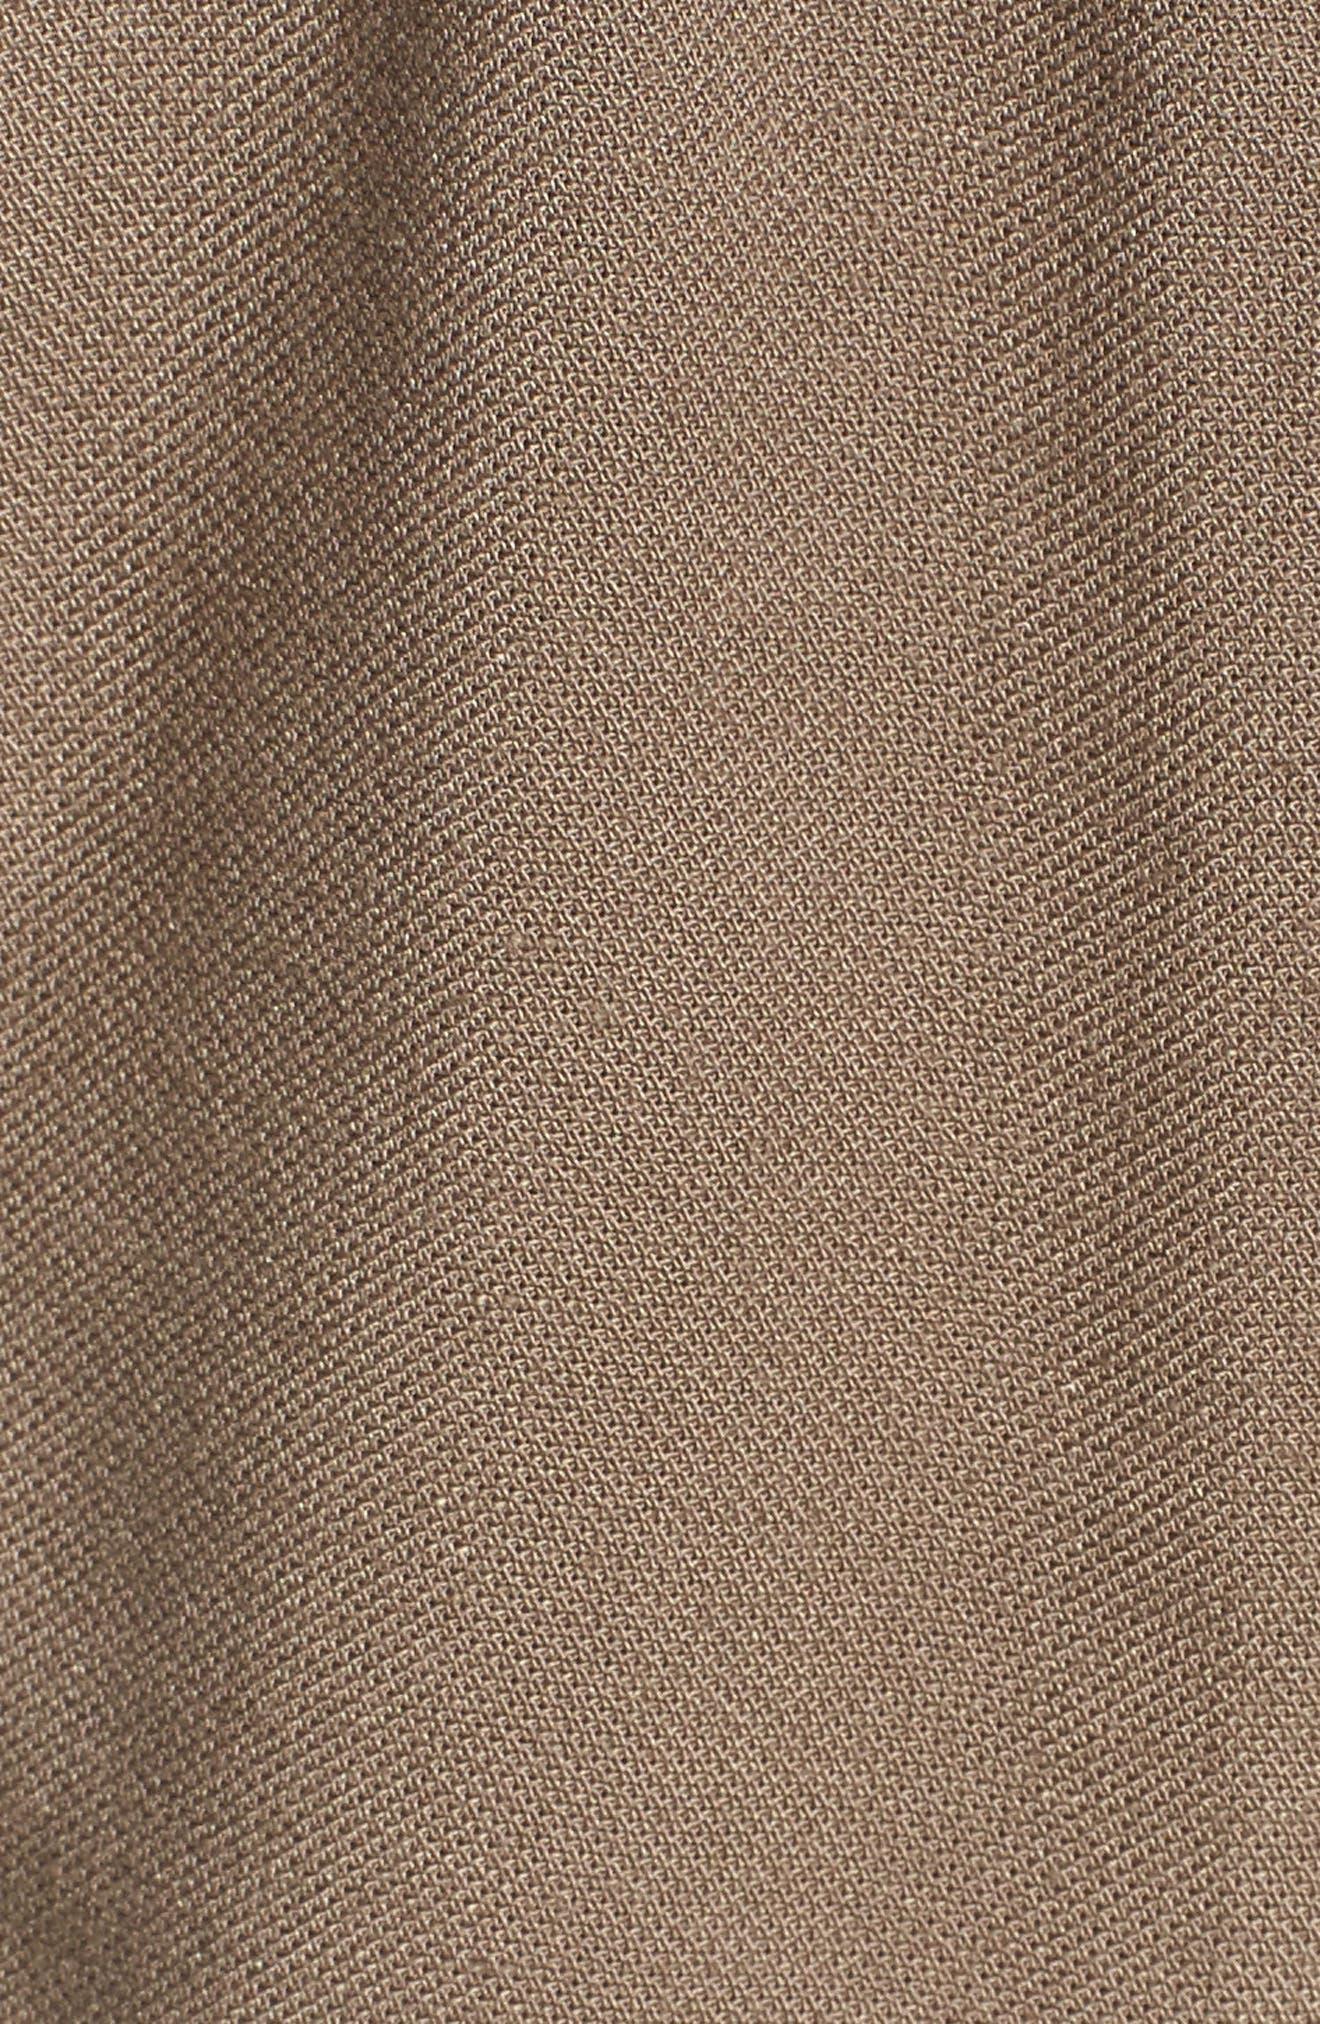 Drawstring Shorts,                             Alternate thumbnail 5, color,                             335